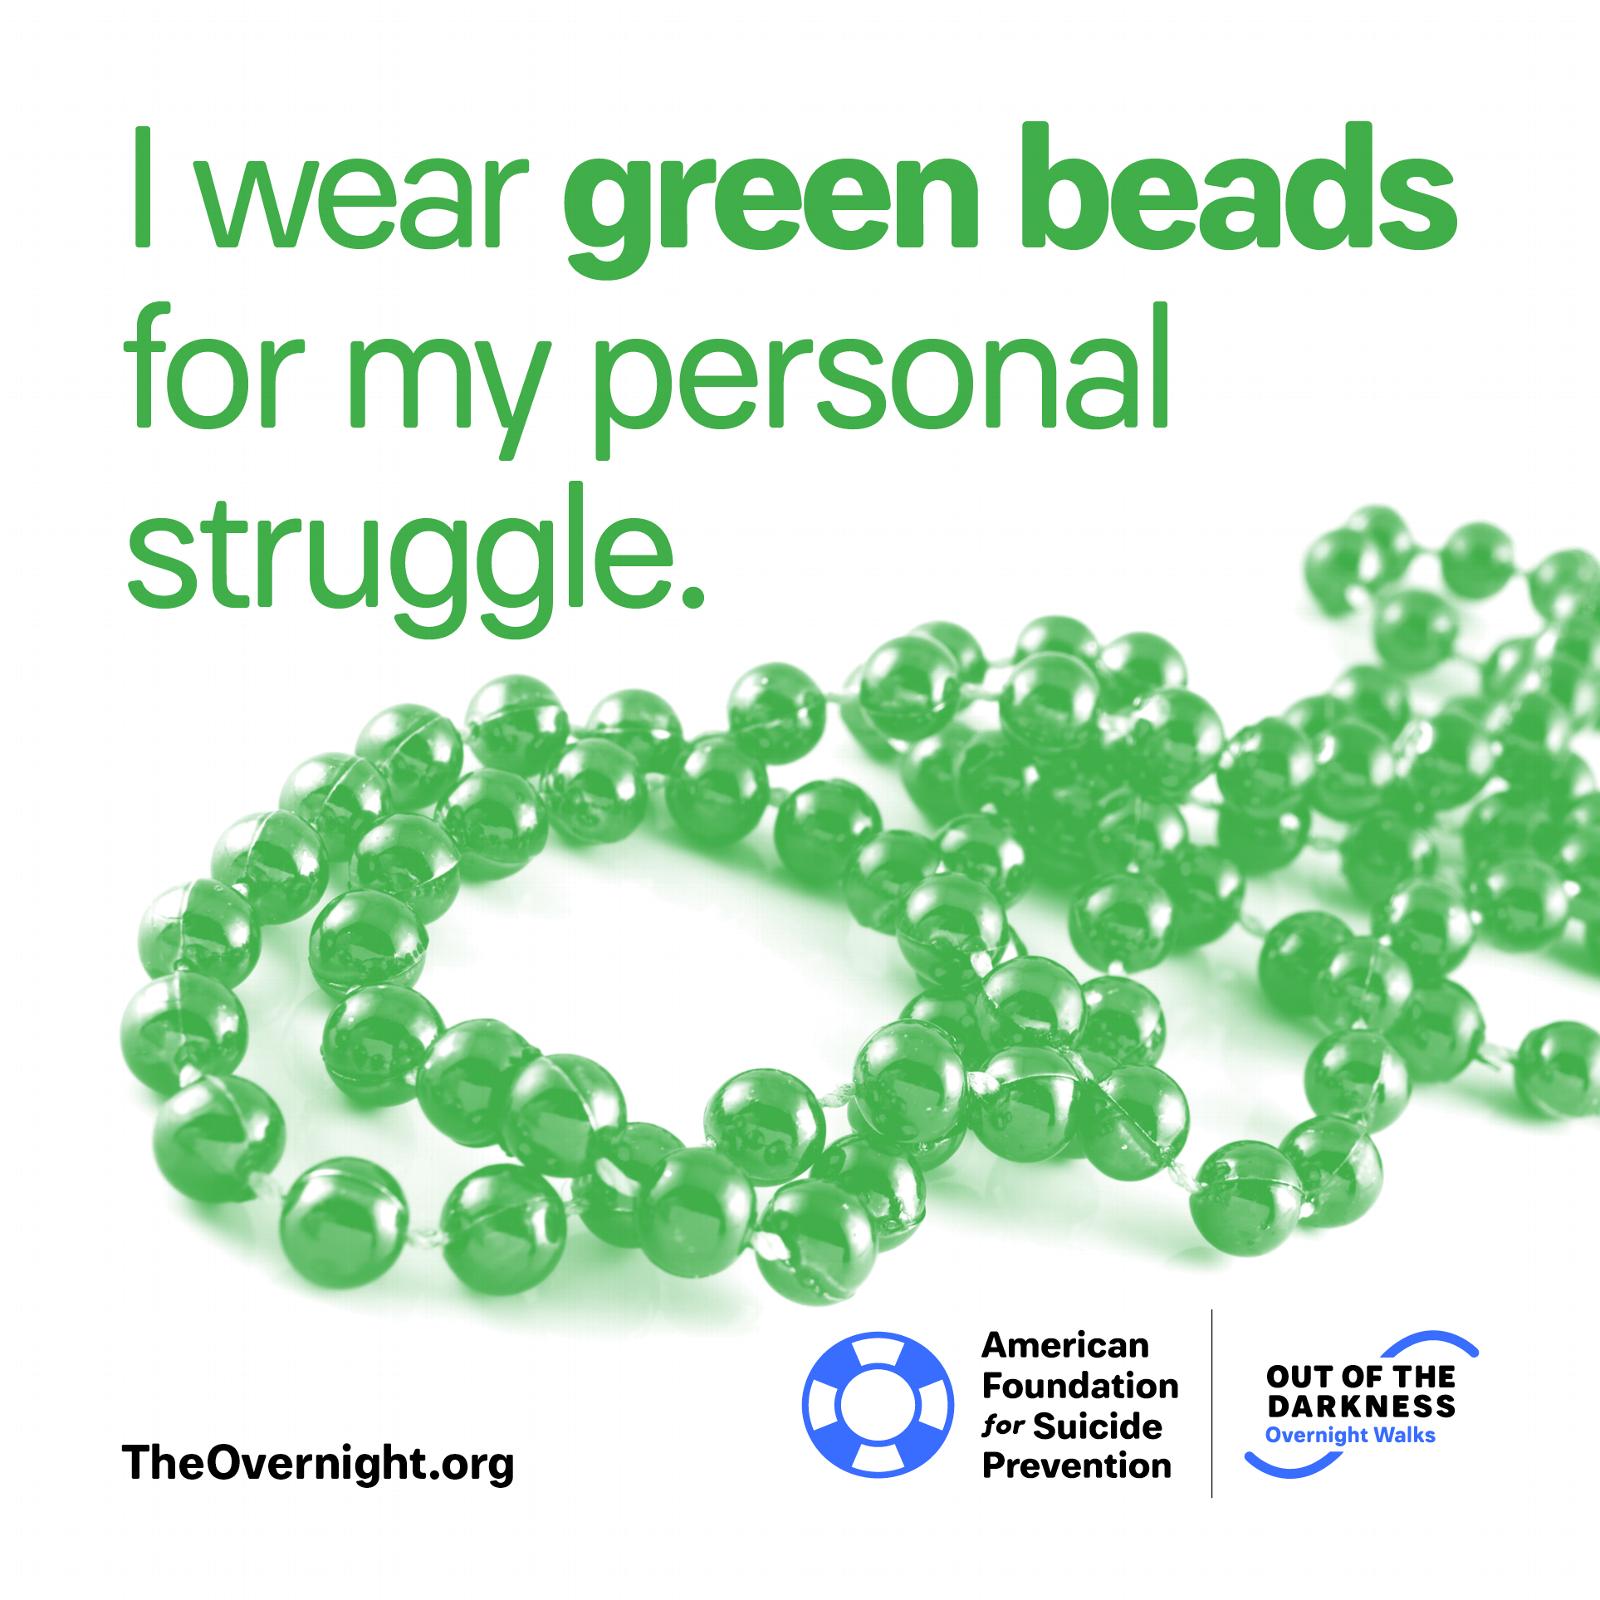 I Wear Green Beads